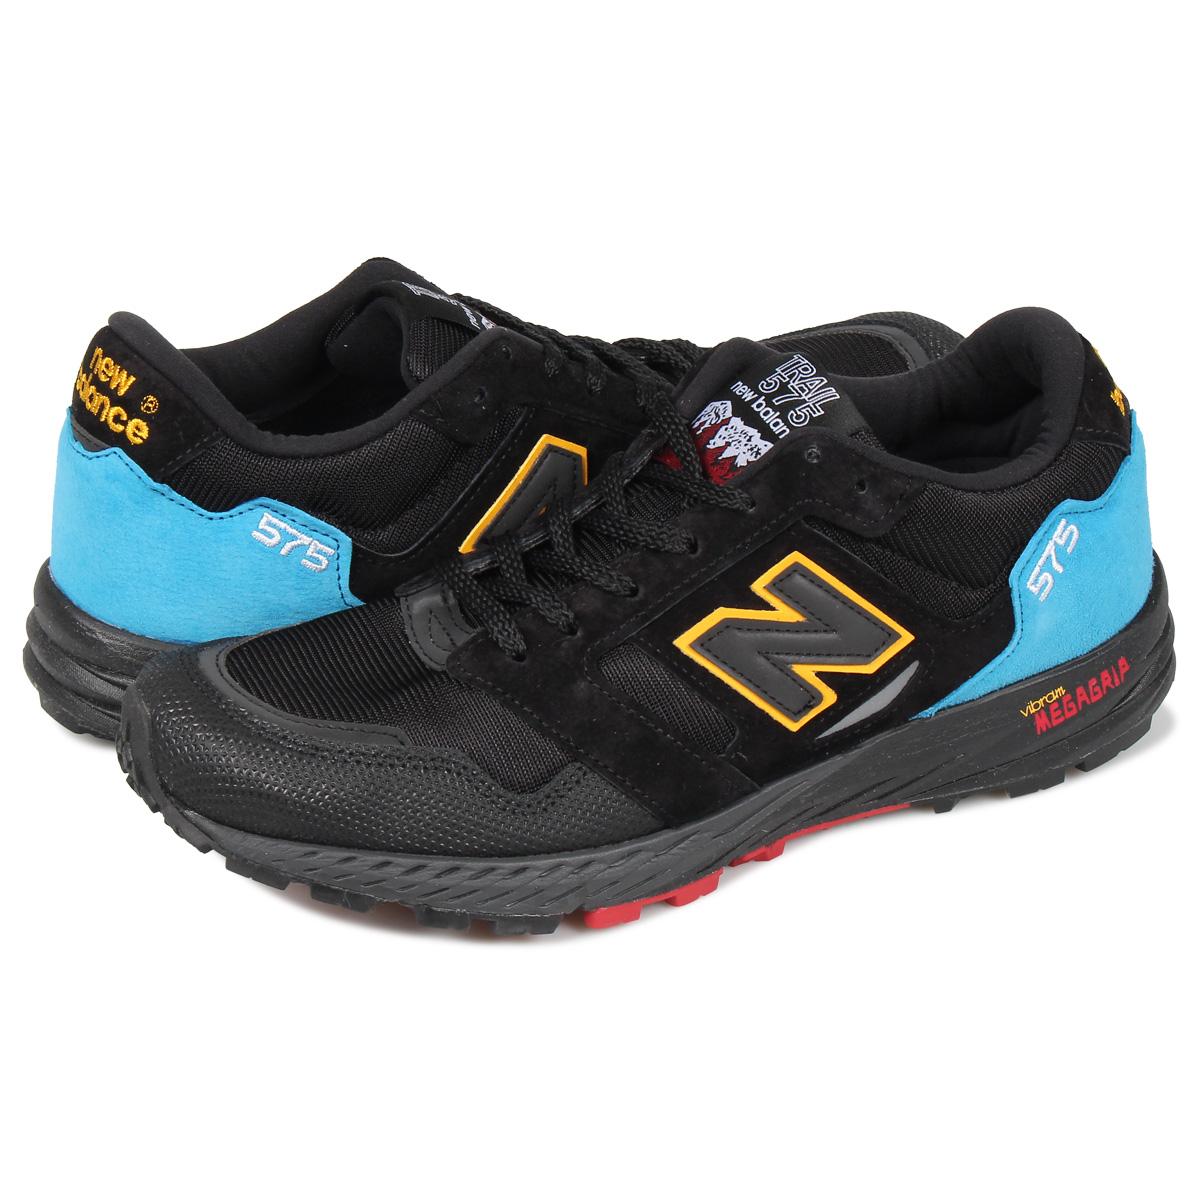 promo code 182c7 2940e new balance MTL575UT New Balance 575 sneakers men D Wise MADE IN UK black  black [8/16 Shinnyu load] [198]